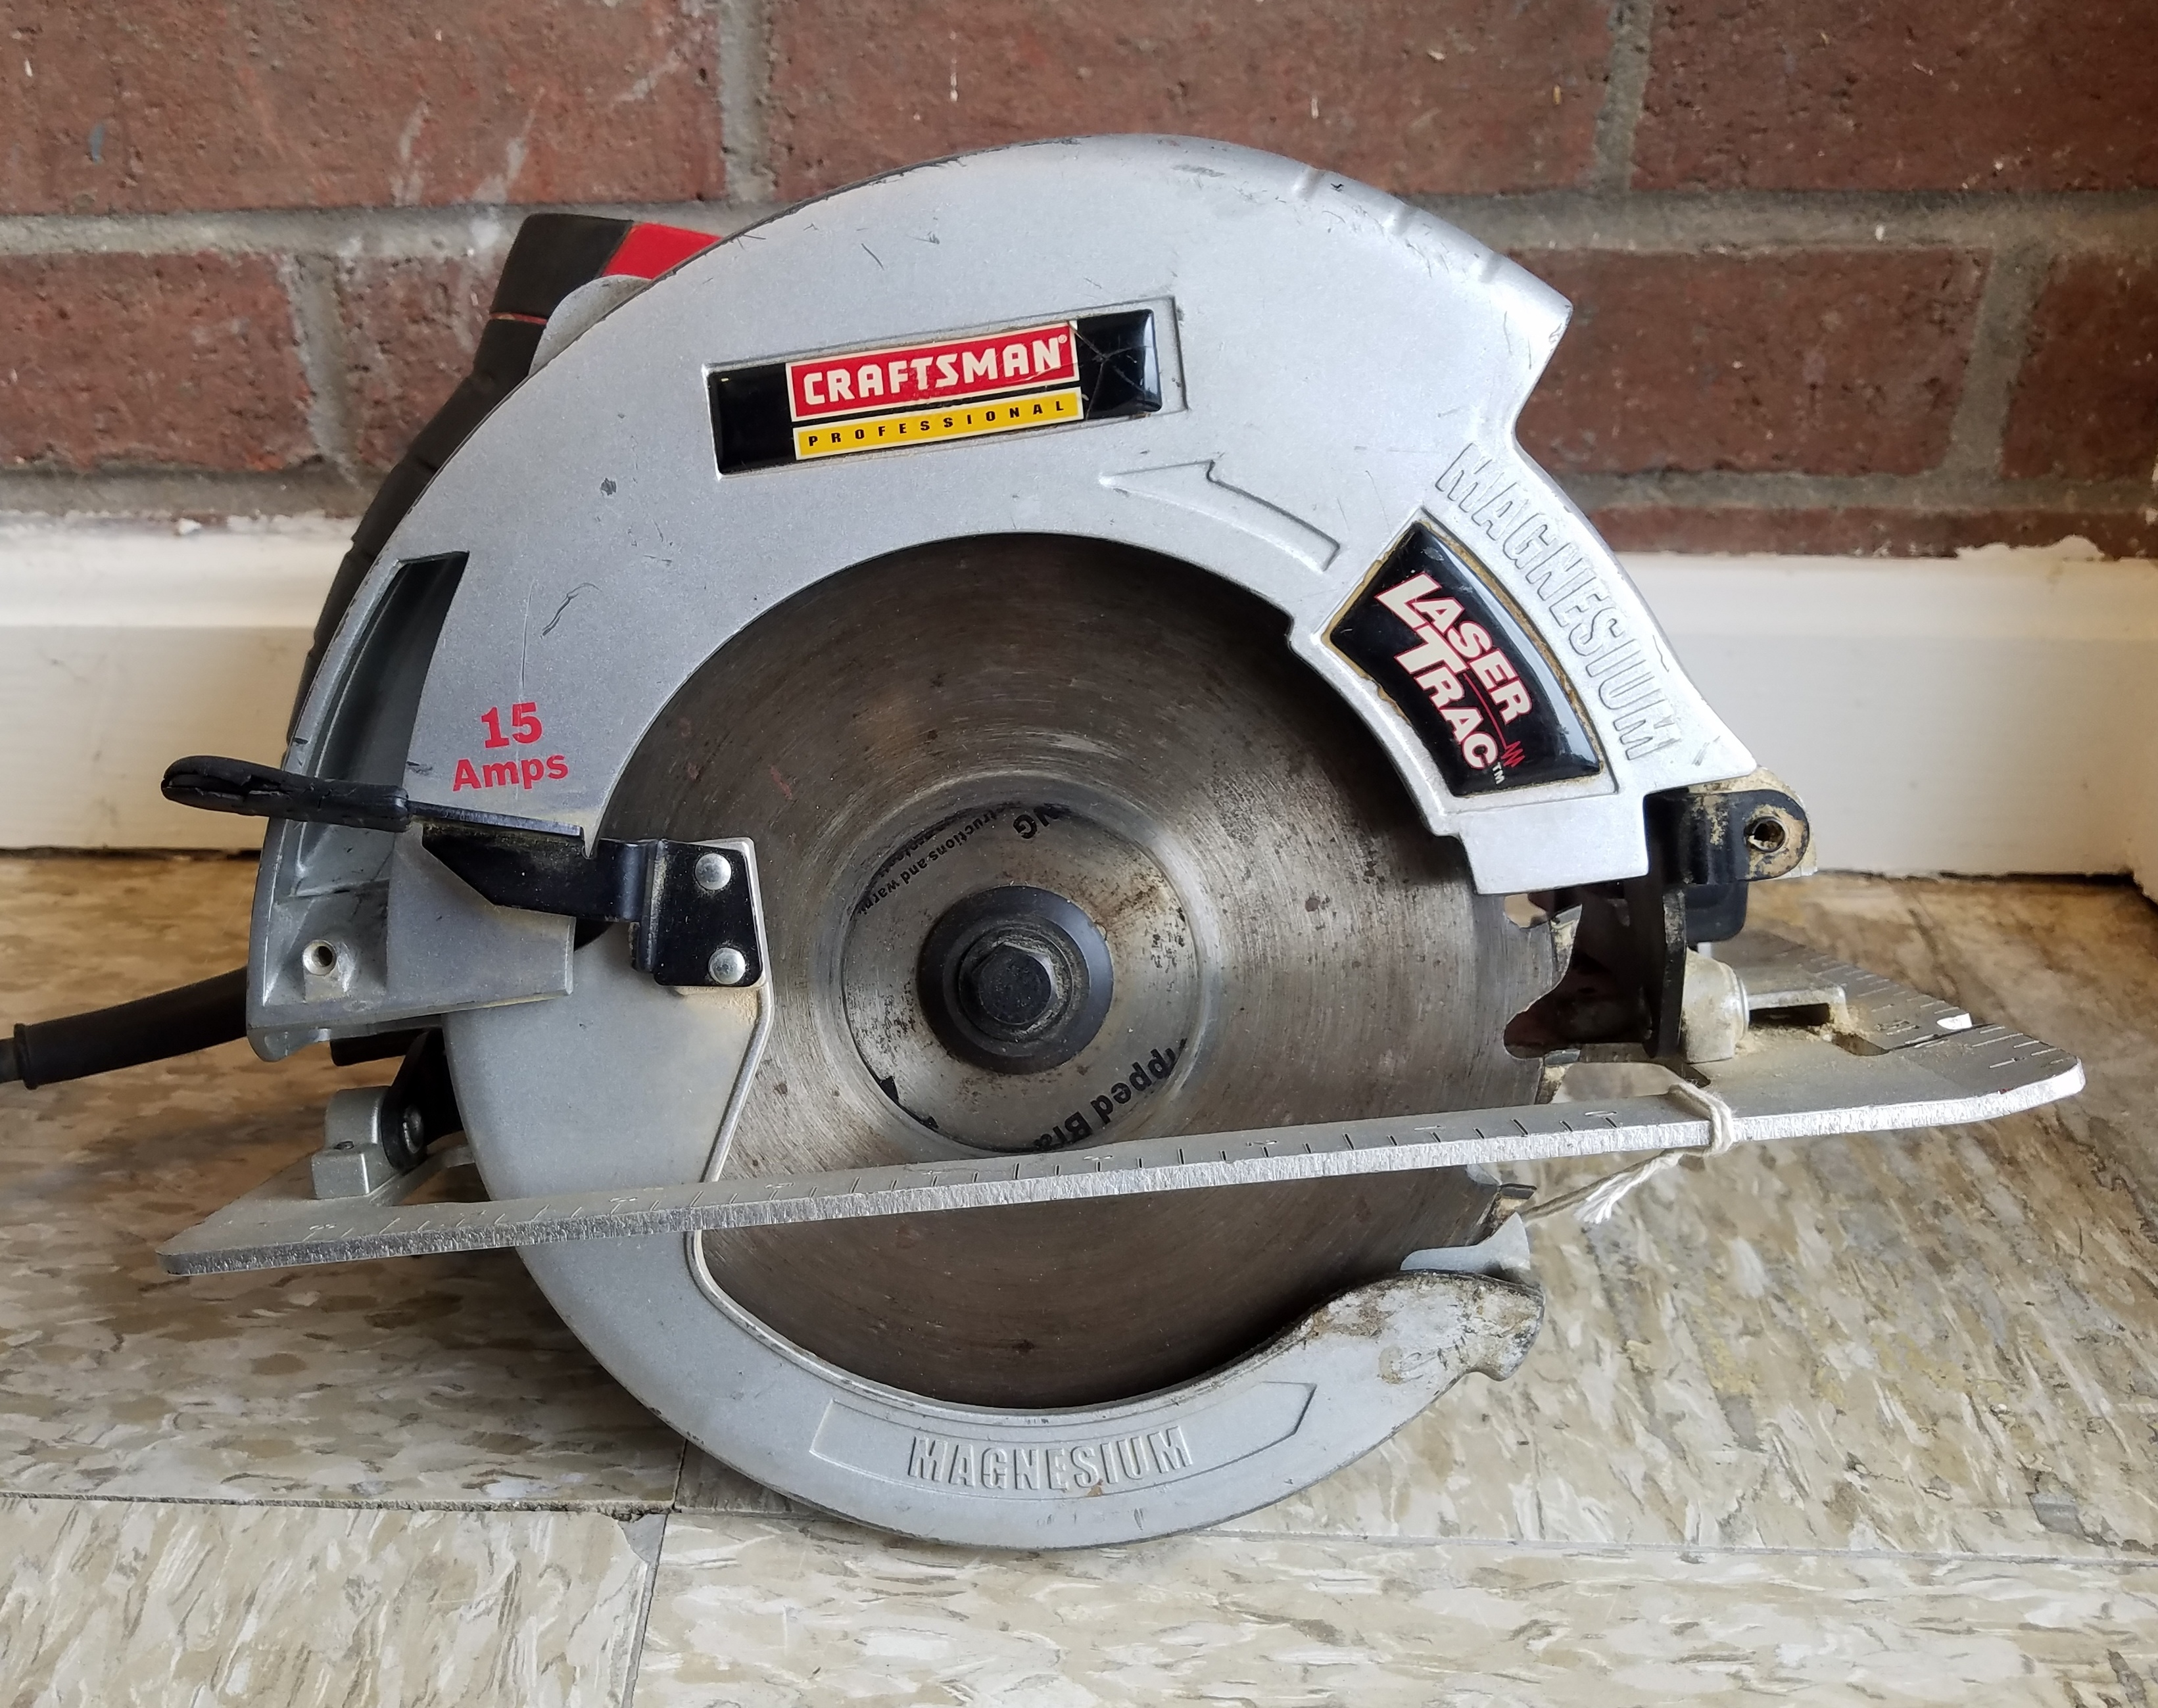 CRAFTSMAN 320.28060 CIRCULAR SAW POWER TOOLS